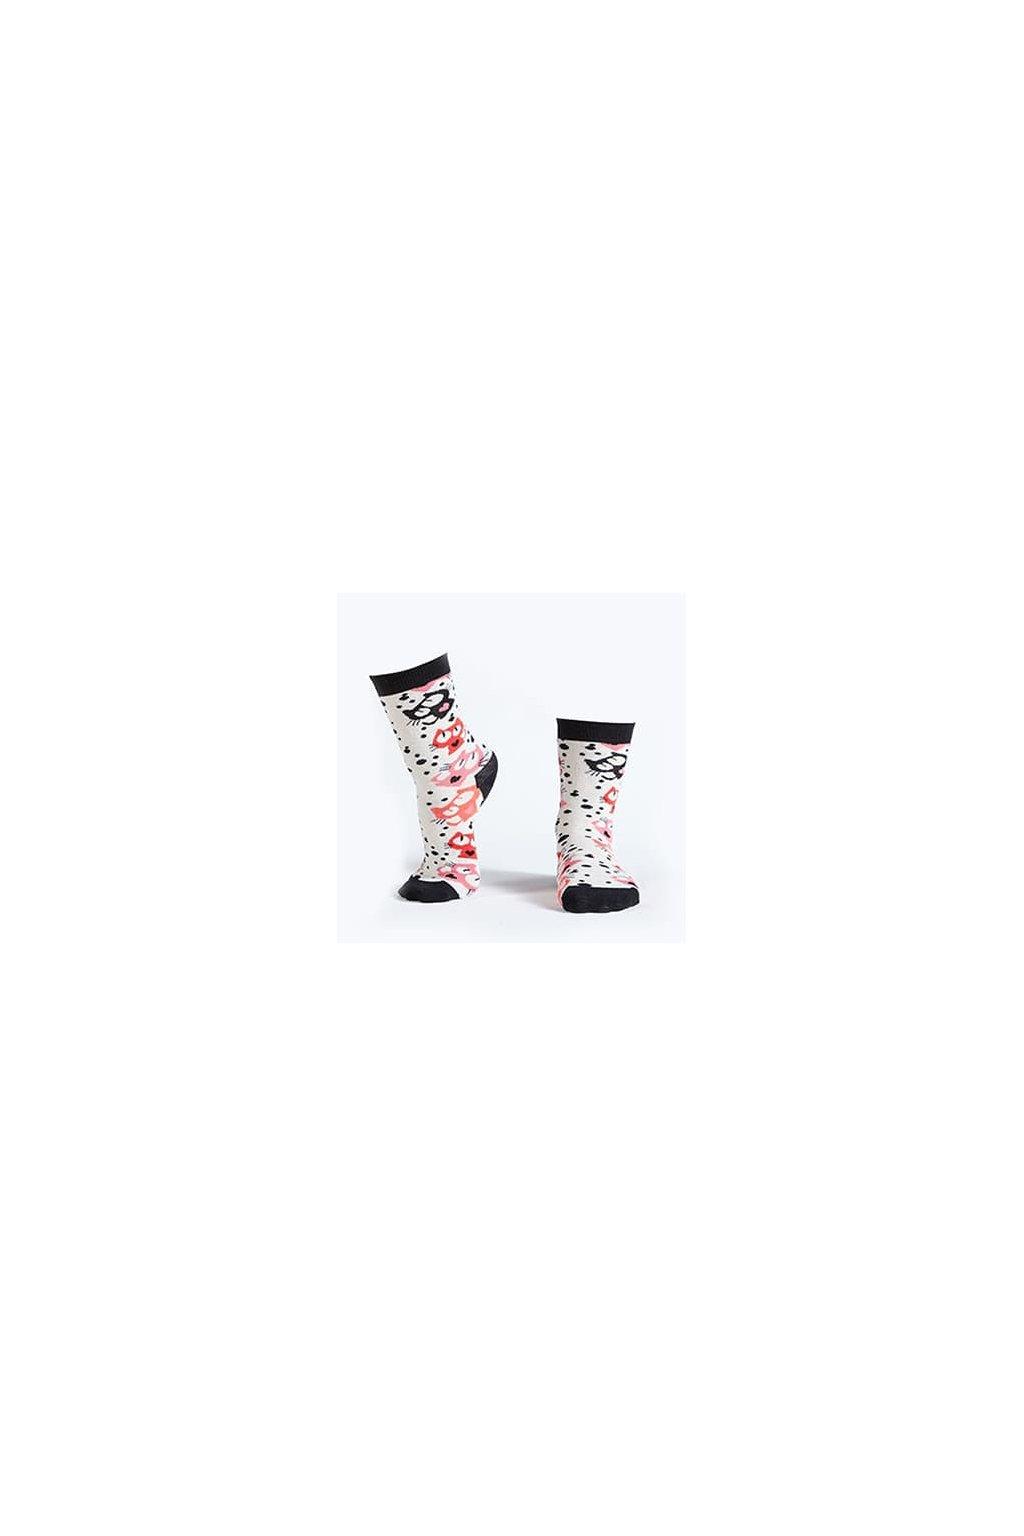 Dámské klasické krémové ponožky s barevnými kočkami